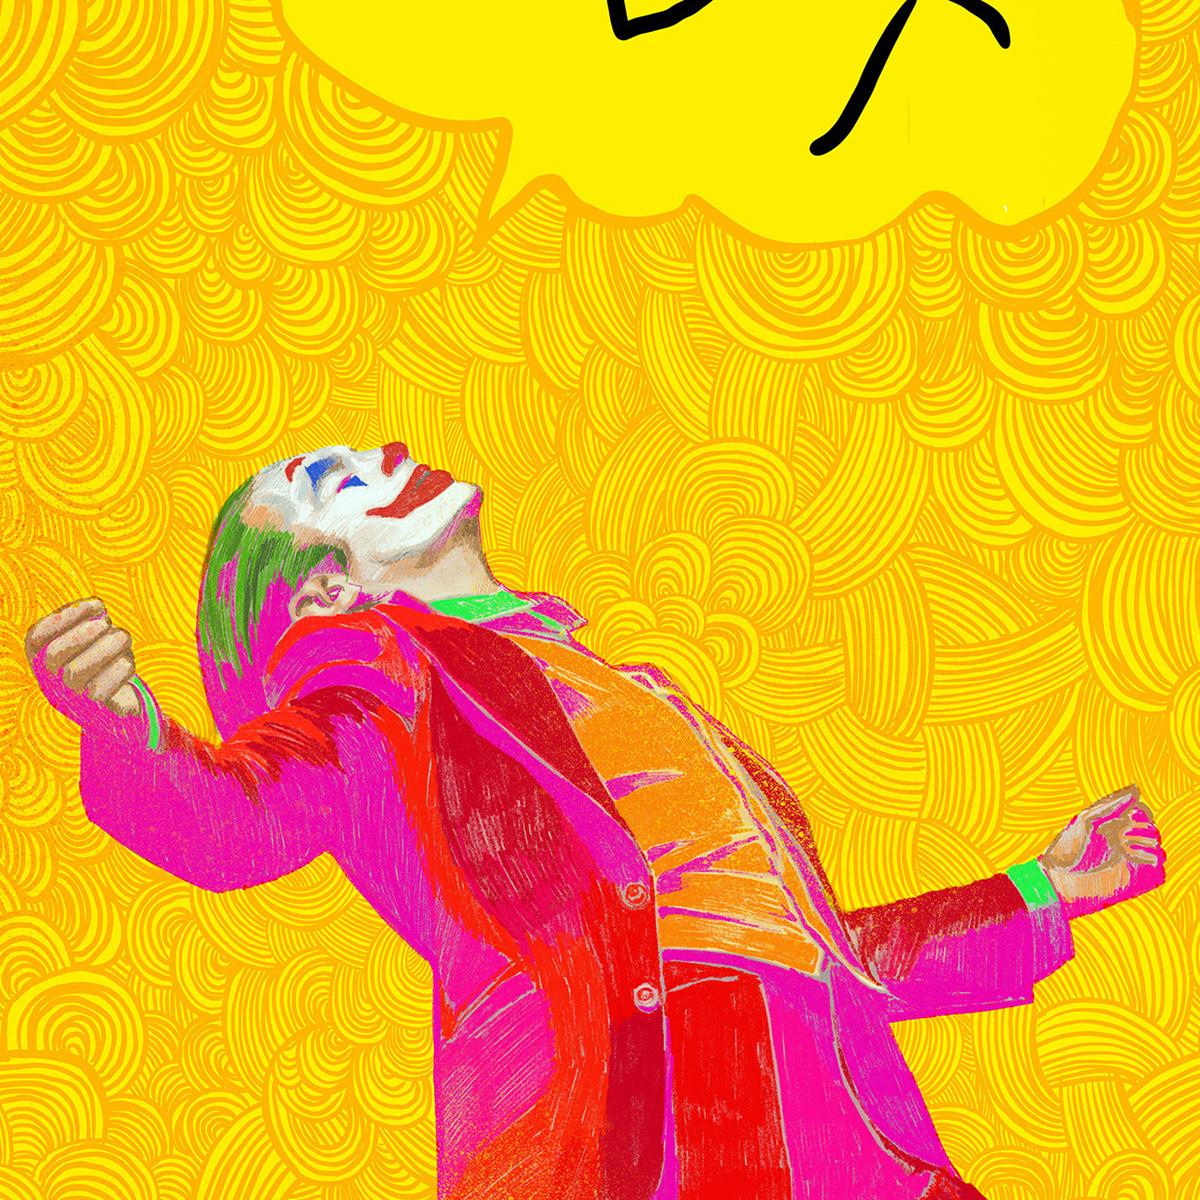 joker jokermovie joaquin phoenix dc dccomics